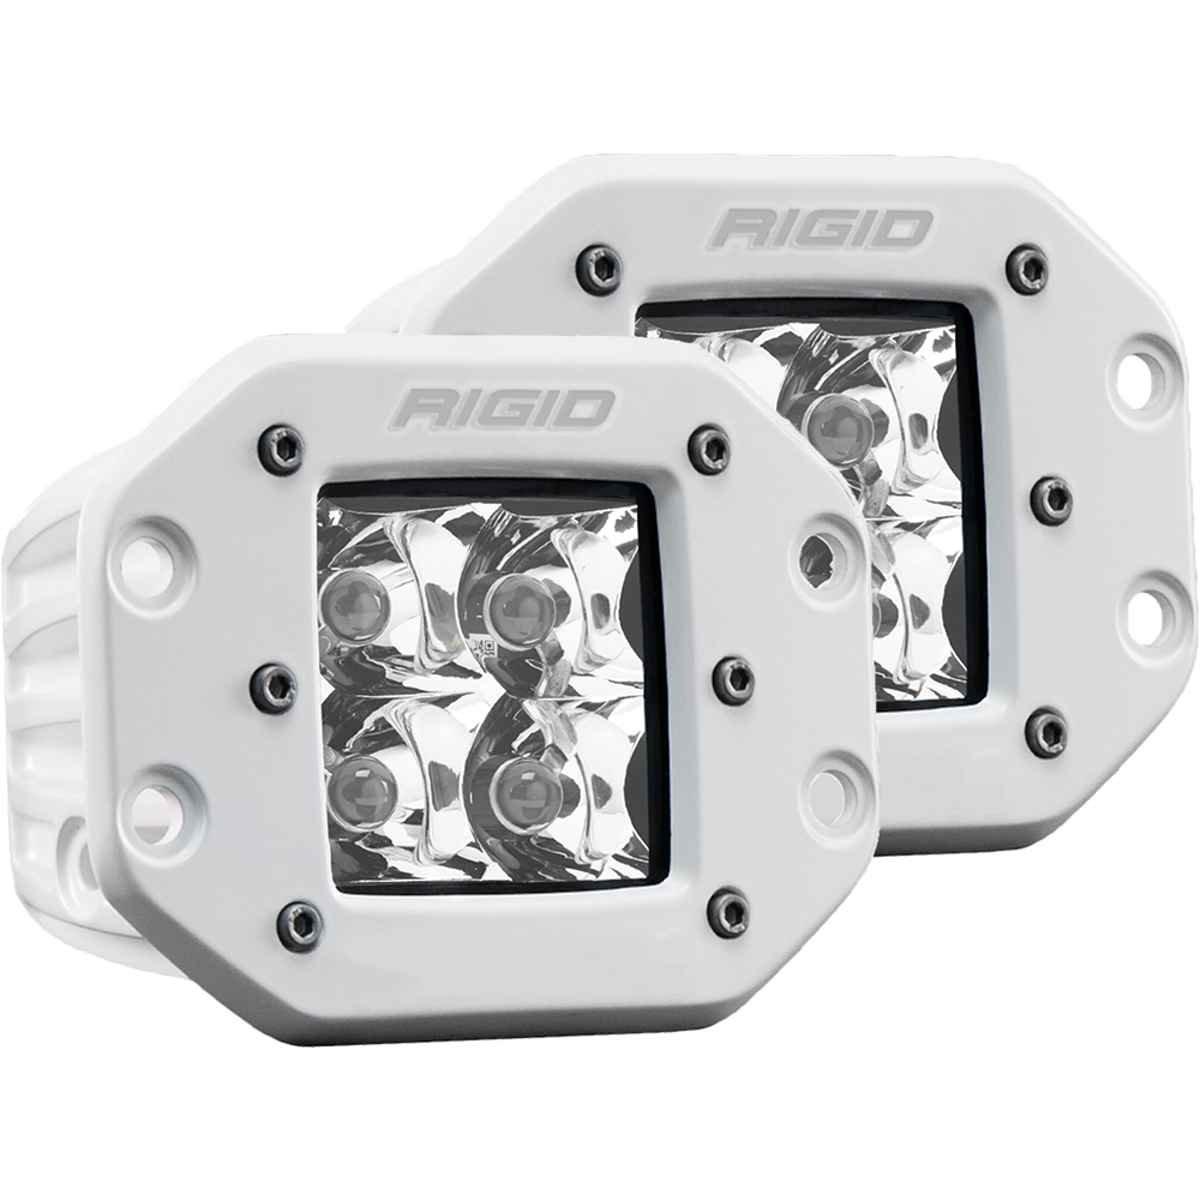 Rigid Industries 612213 M-Series Dually 10 Deg. Spot LED Light